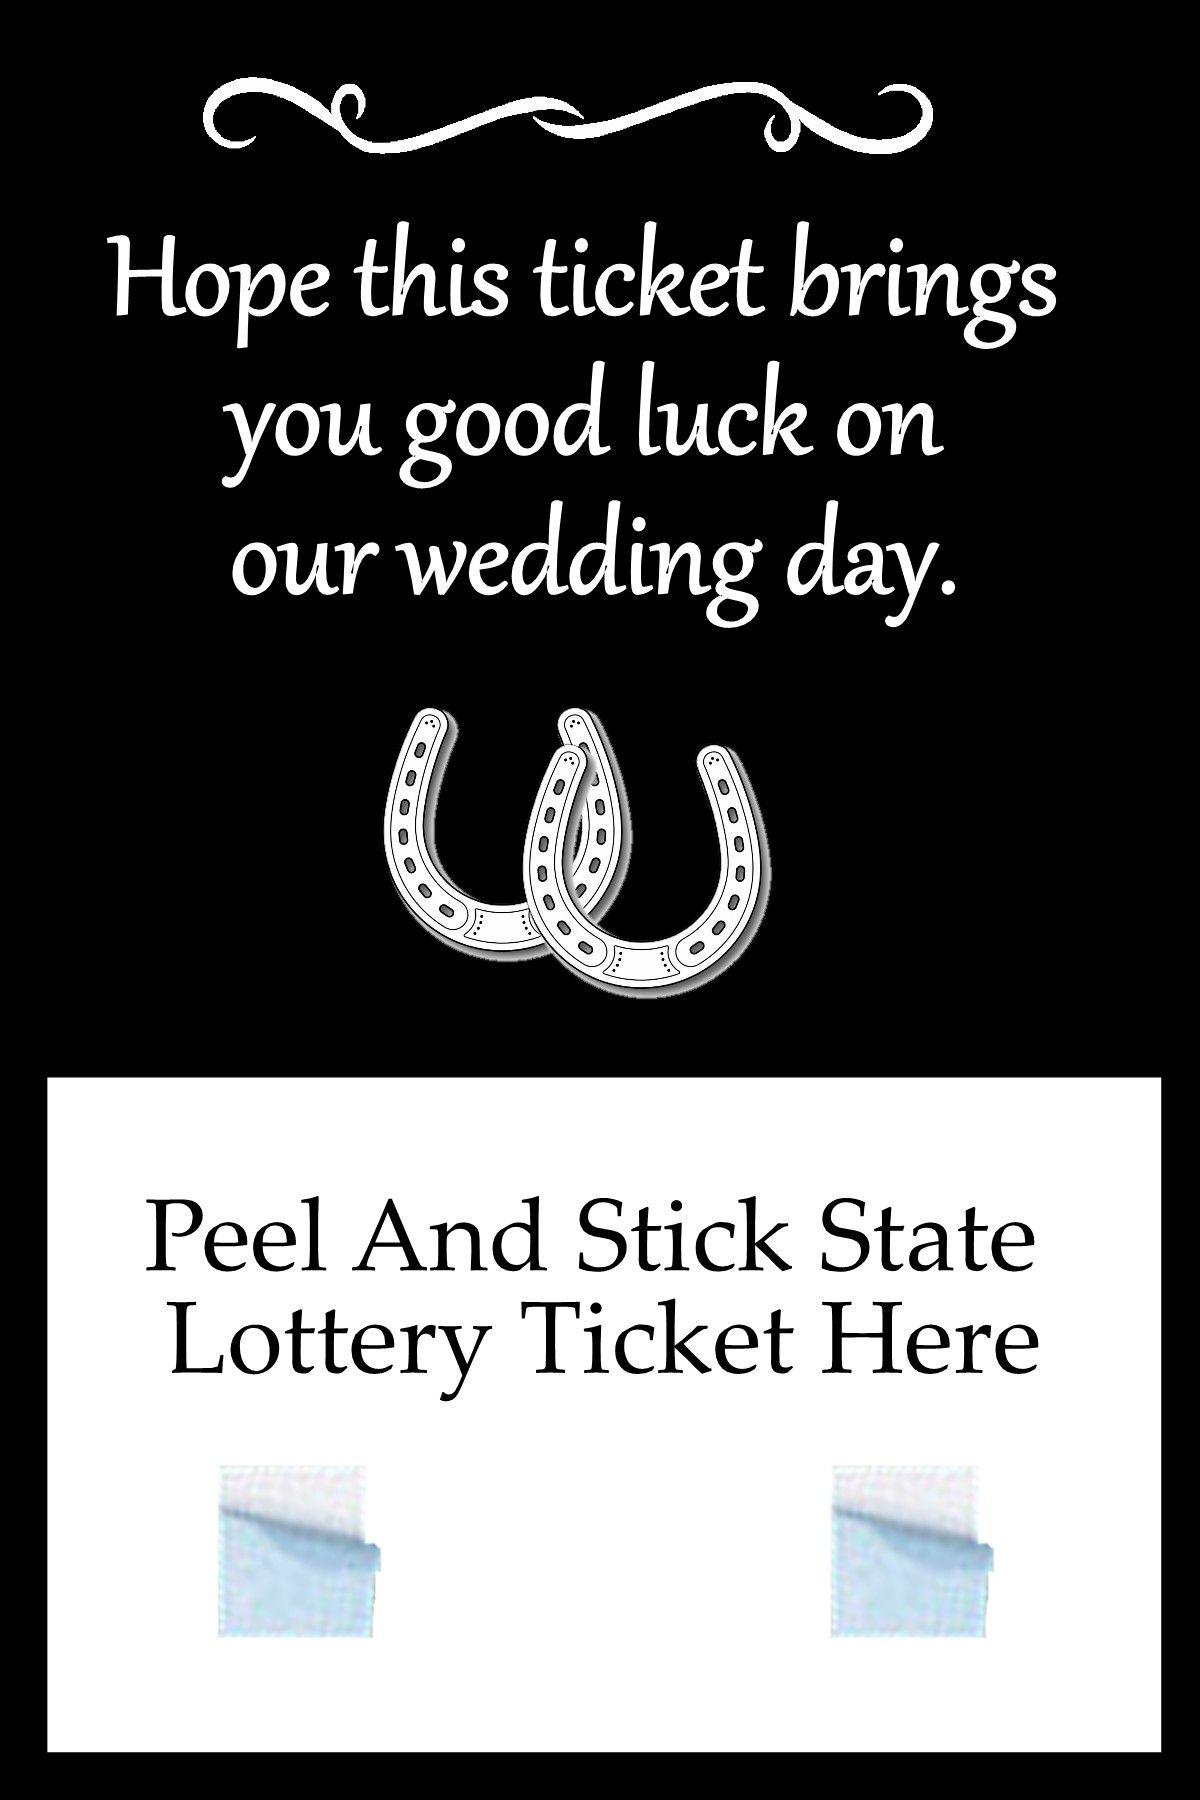 Horseshoe Good Luck Wedding Lottery Ticket Holder Favor